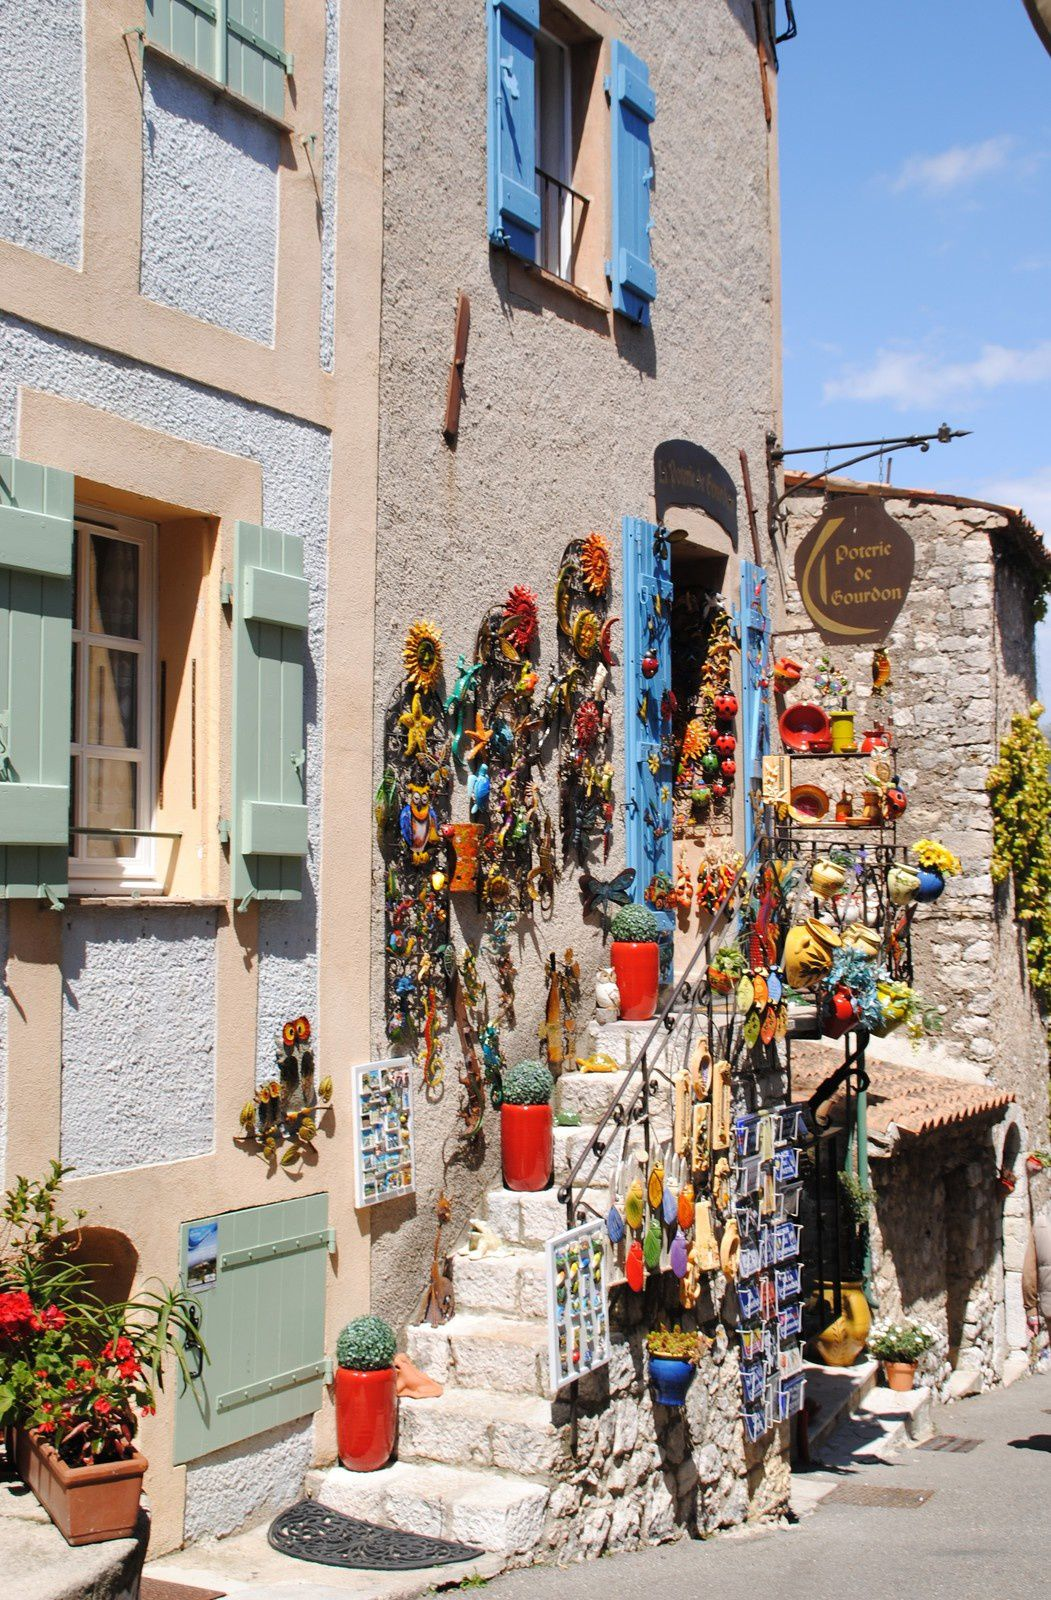 Gourdon Alpes-Maritimes balades d'ici et d'ailleurs